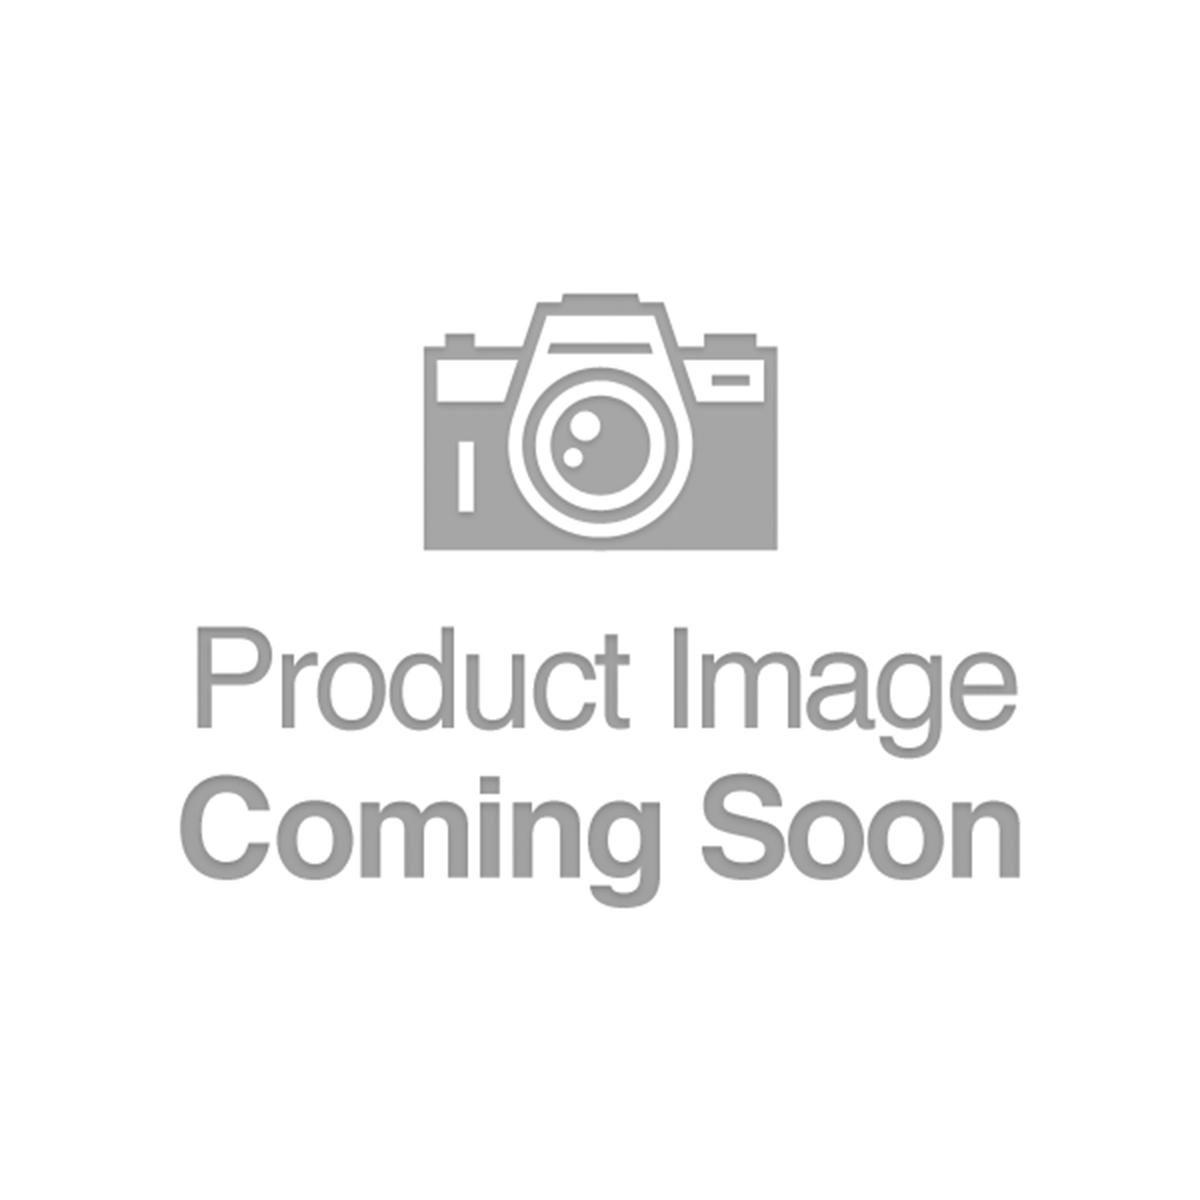 Shreveport - Louisiana - CH 3600 - FR 677 - PMG 30